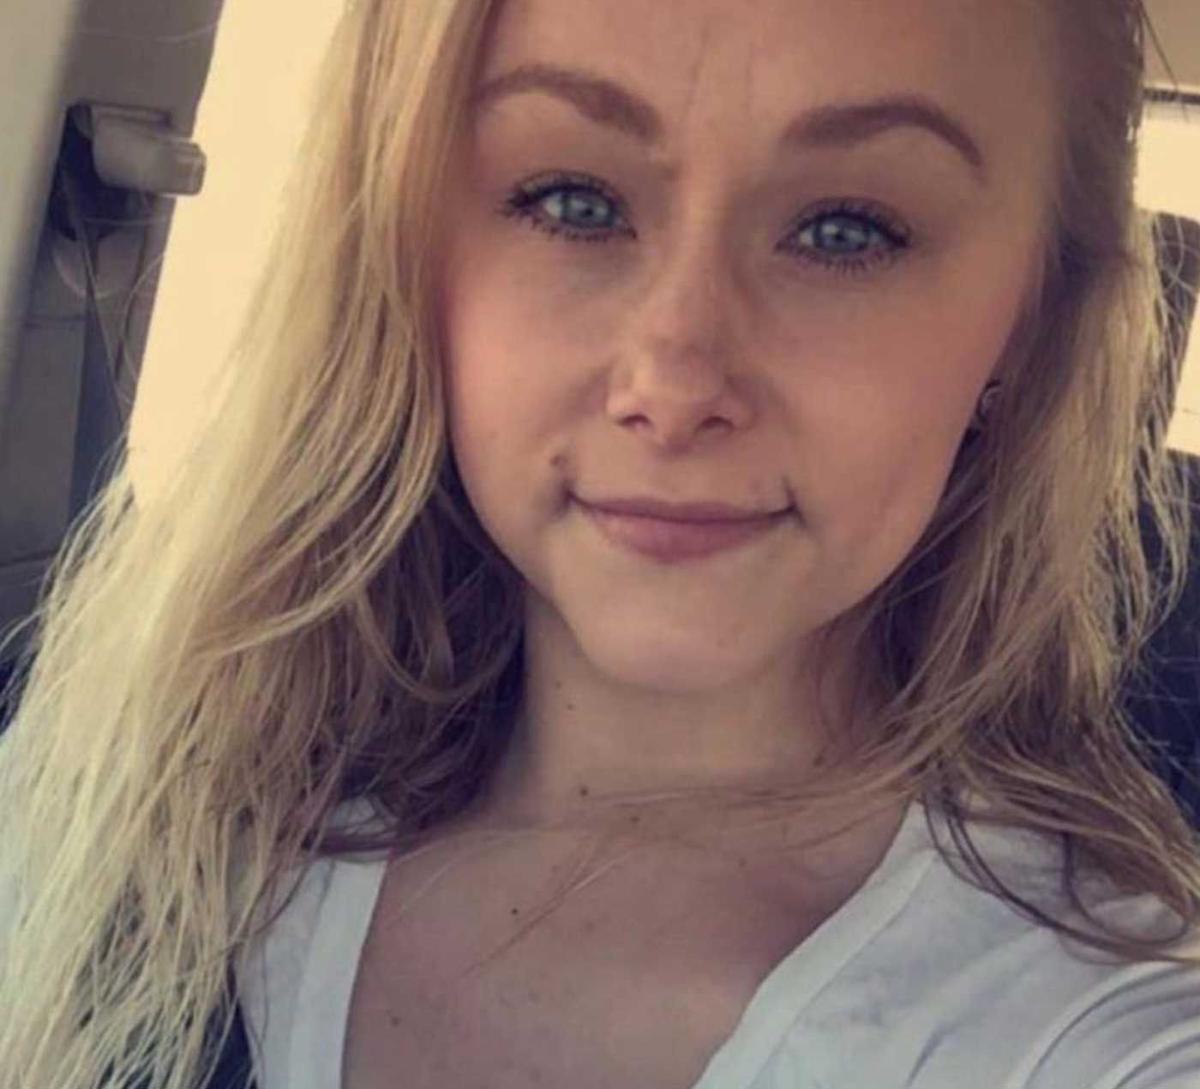 Aubrey Trail claims responsibility for Sydney Loofe's death